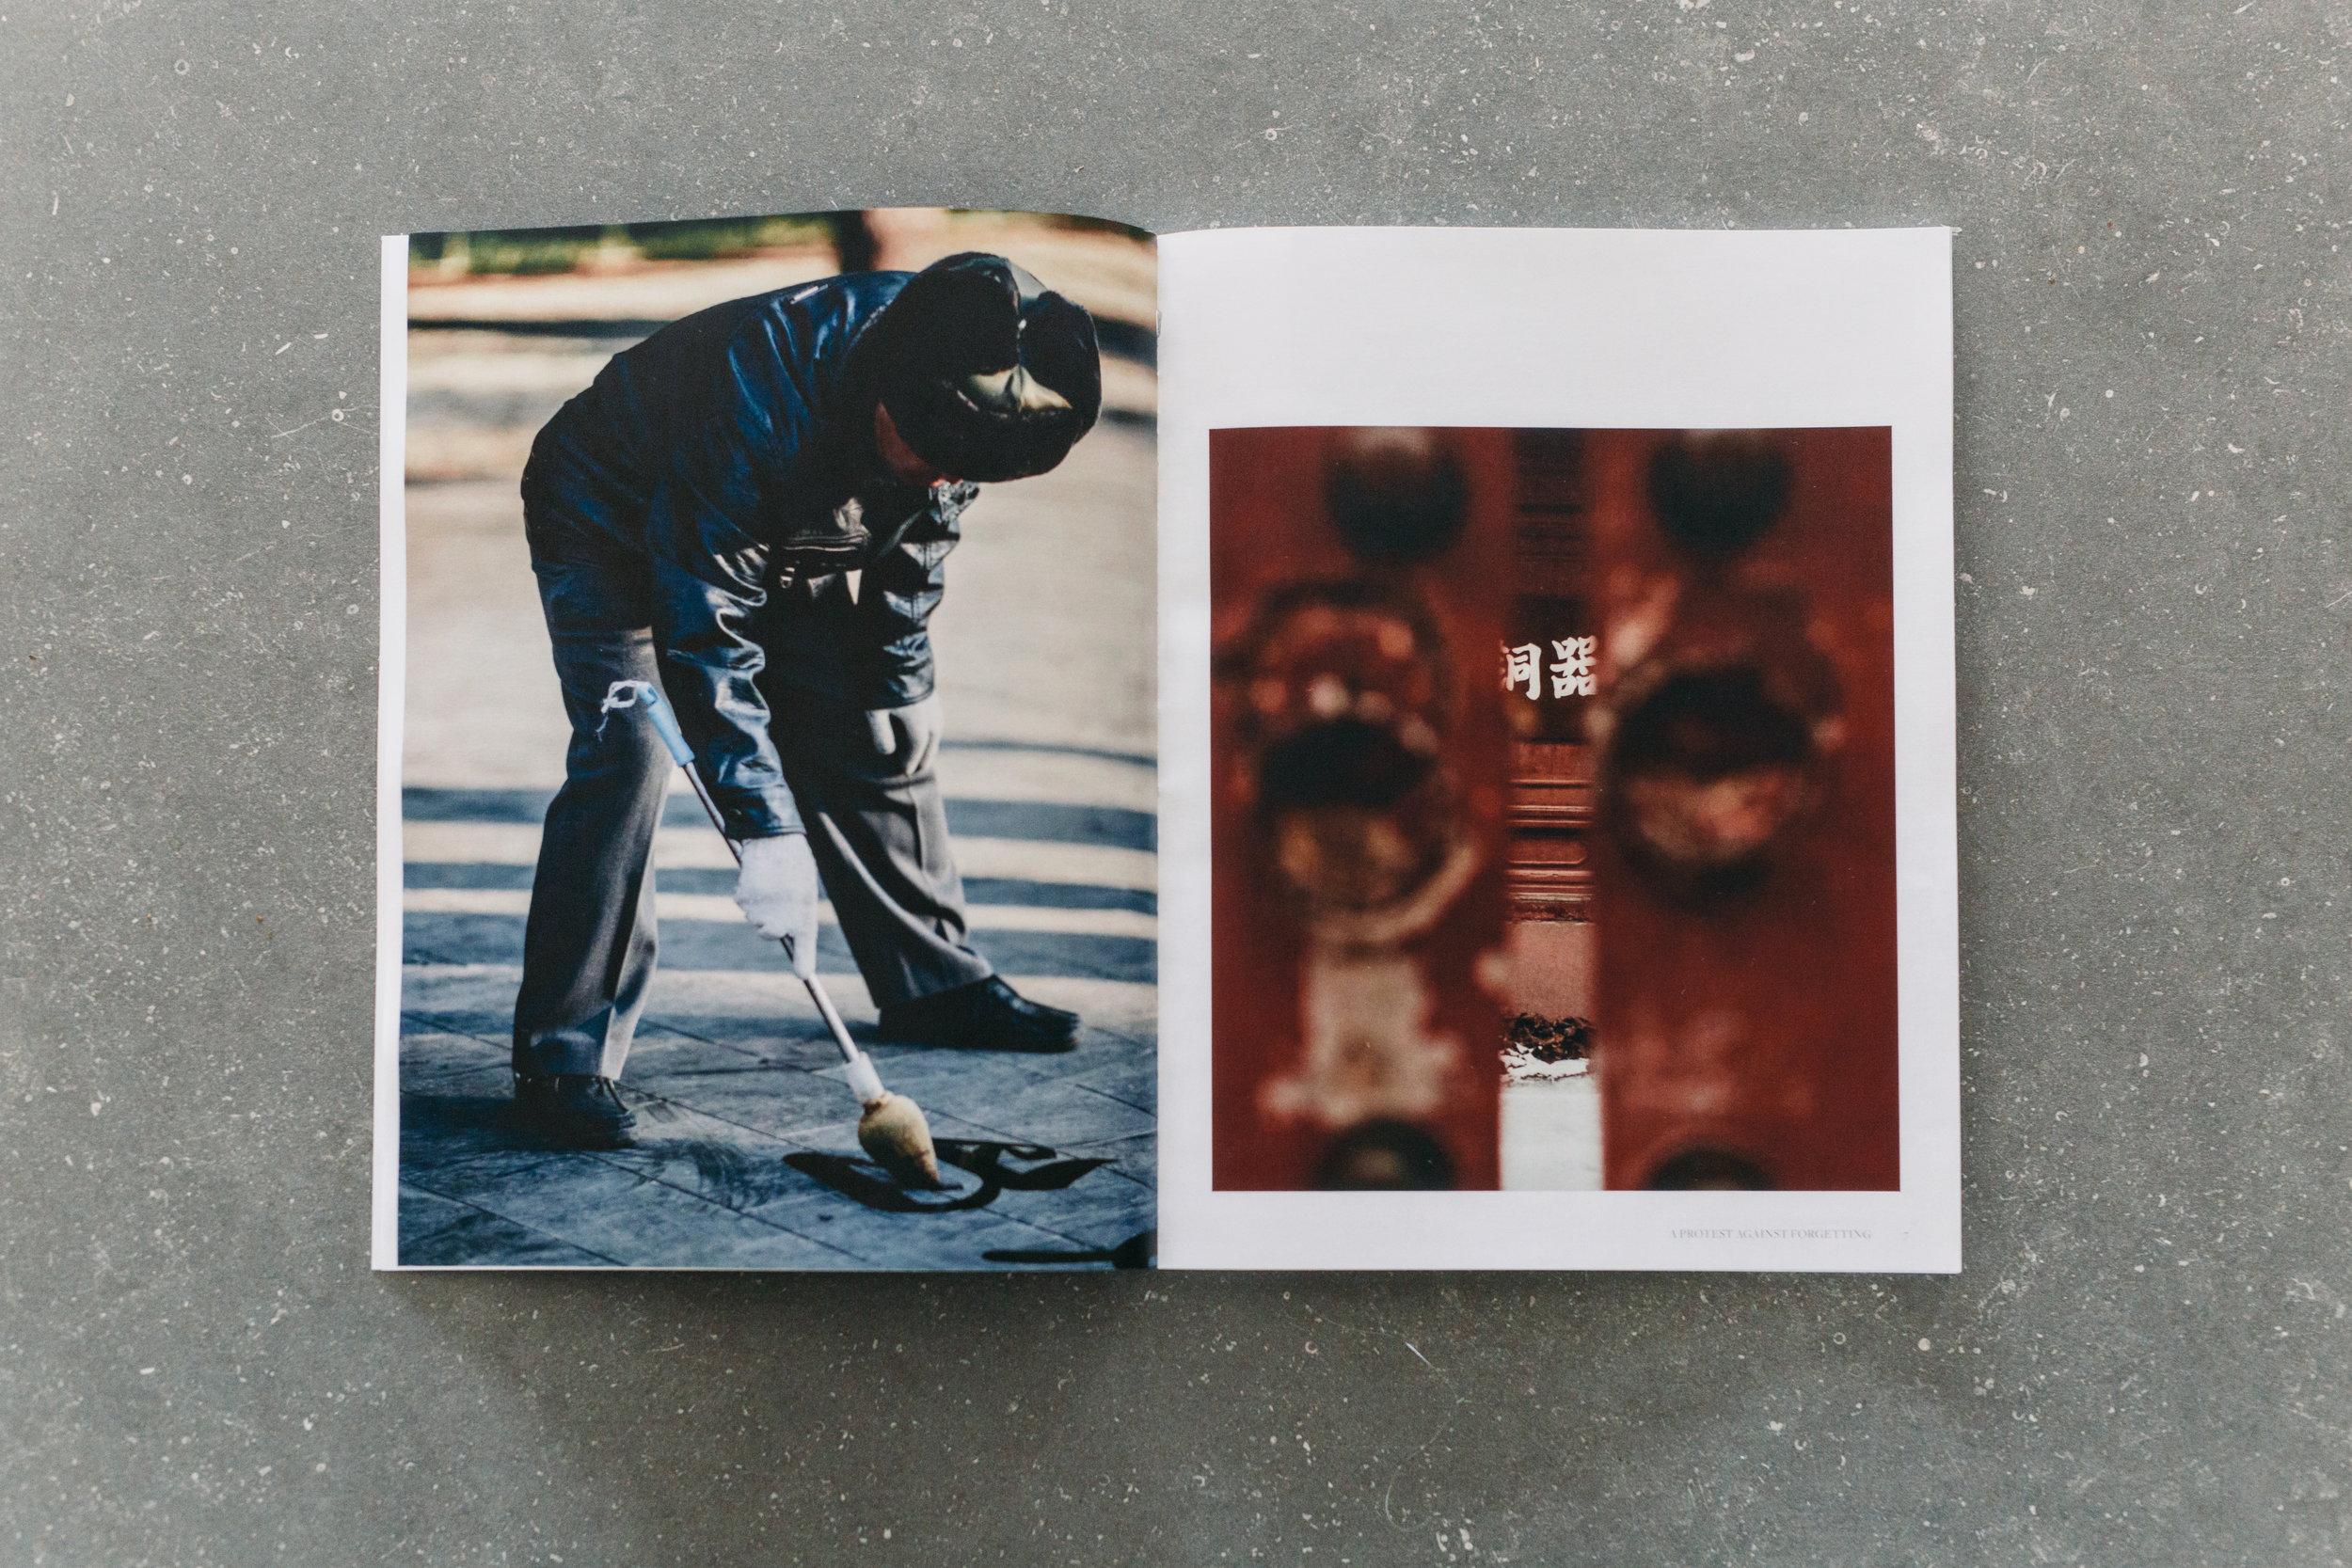 Promo-Books-Photos-TaylorRoades-0035.JPG